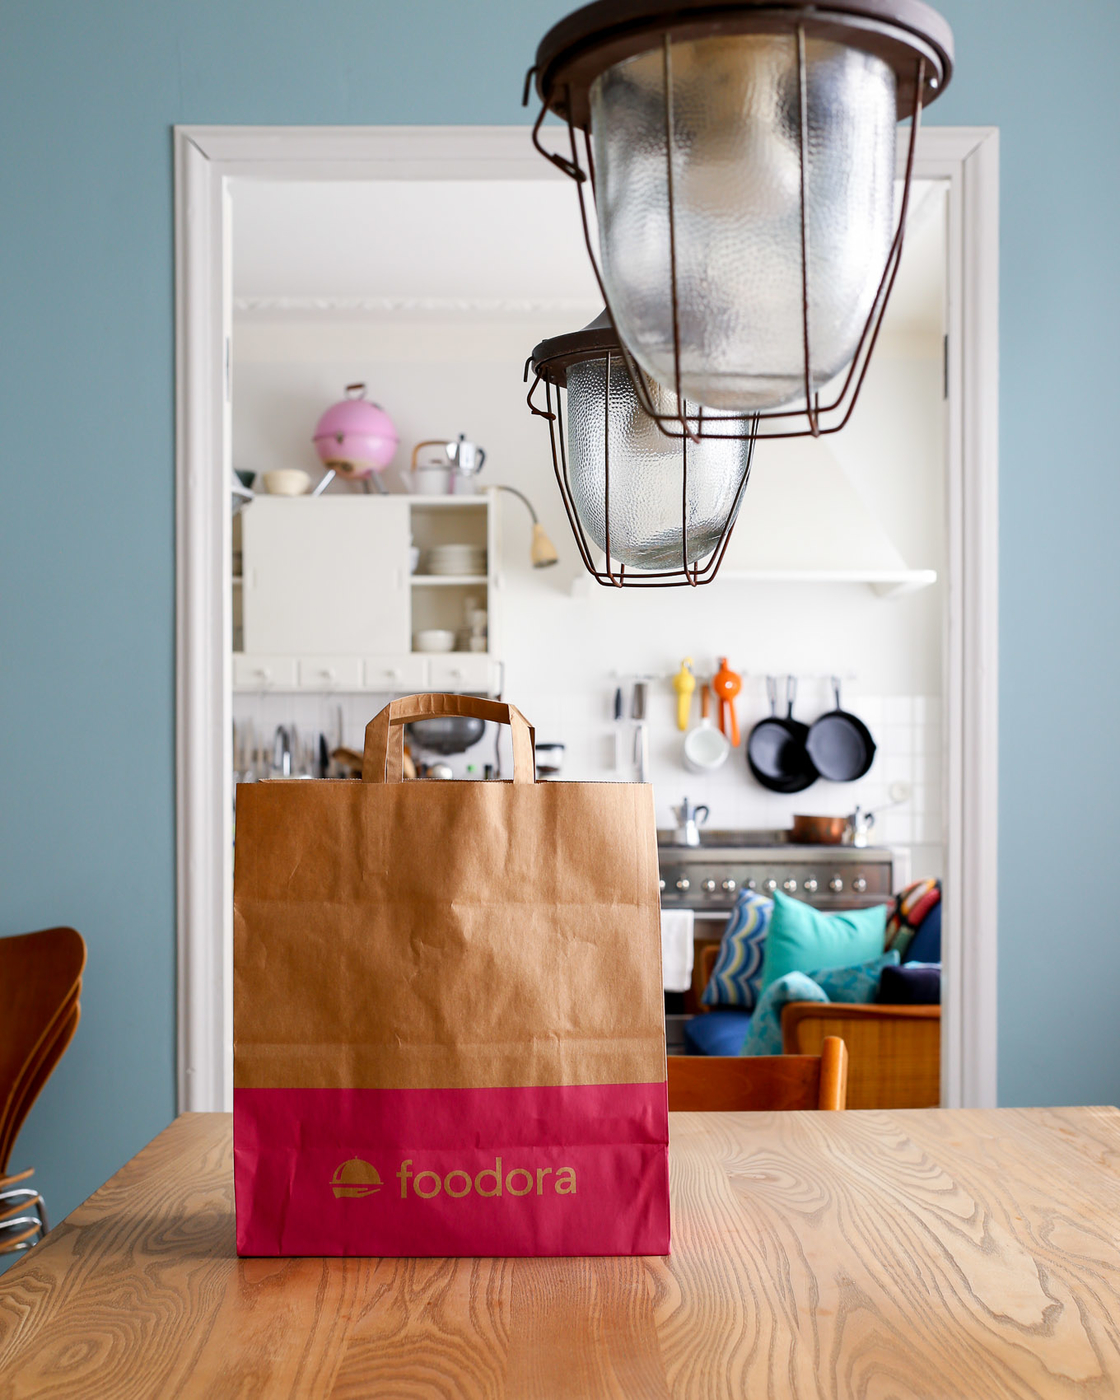 foodora - 01.jpg